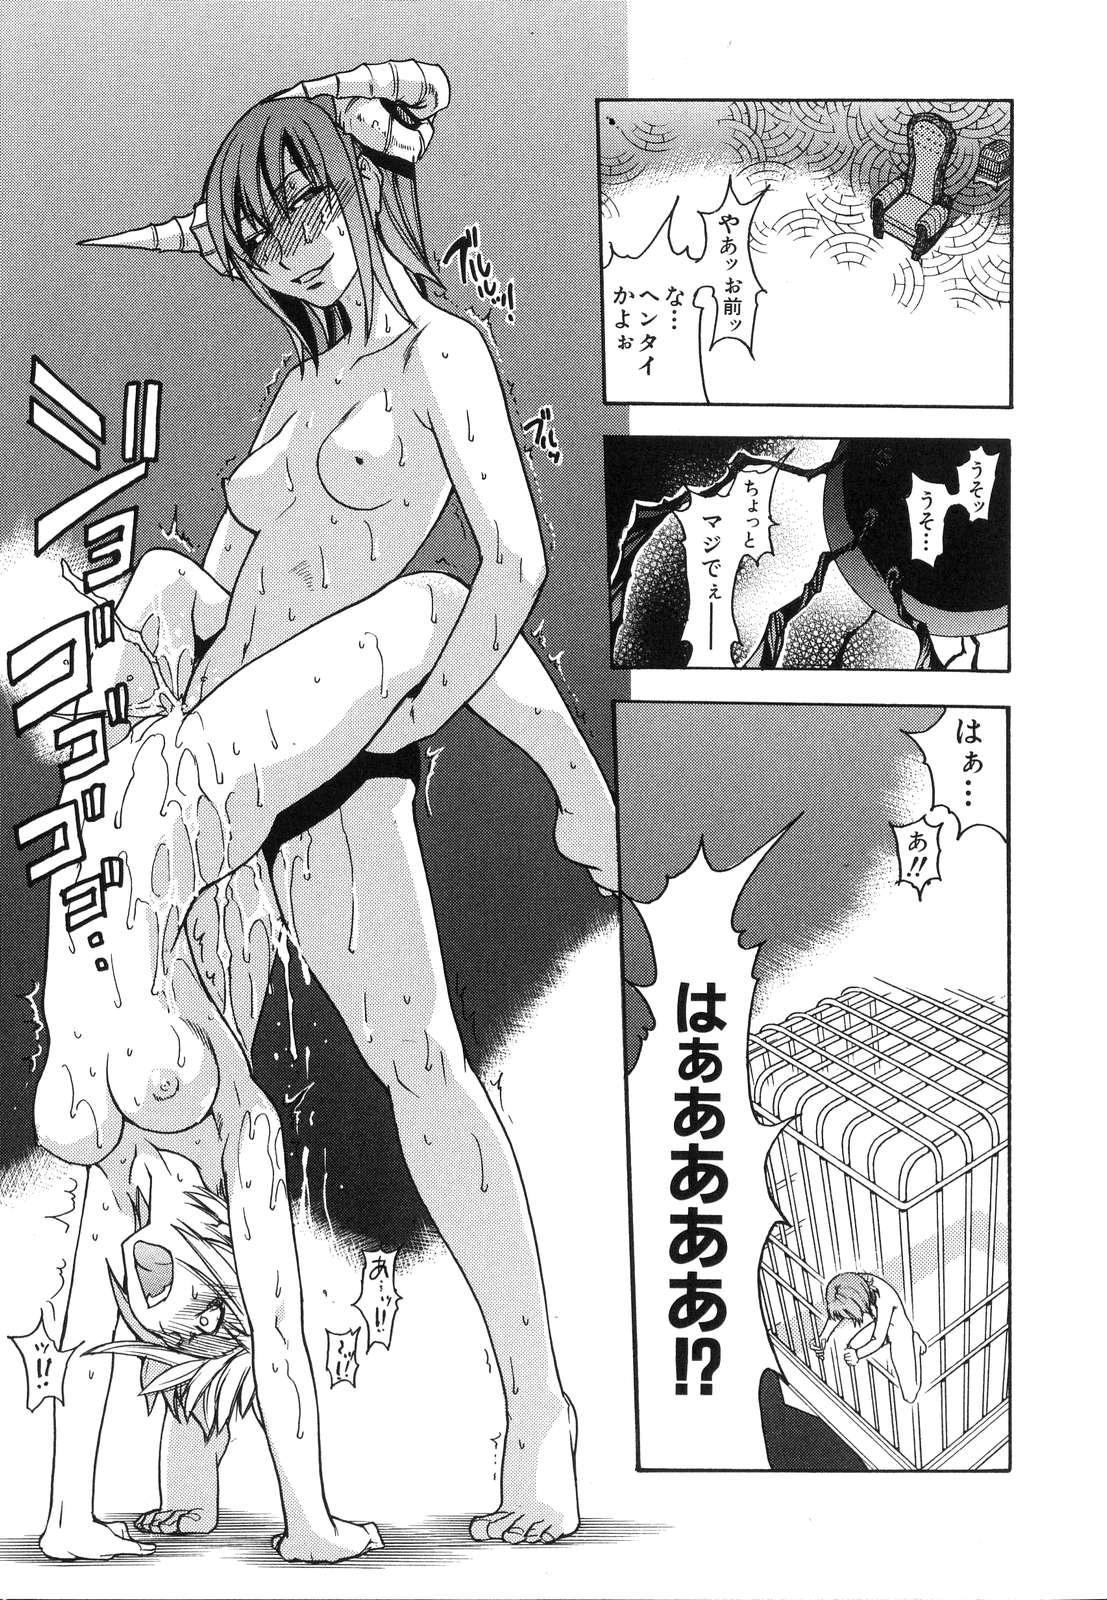 Shining Musume. 6. Rainbow Six 48